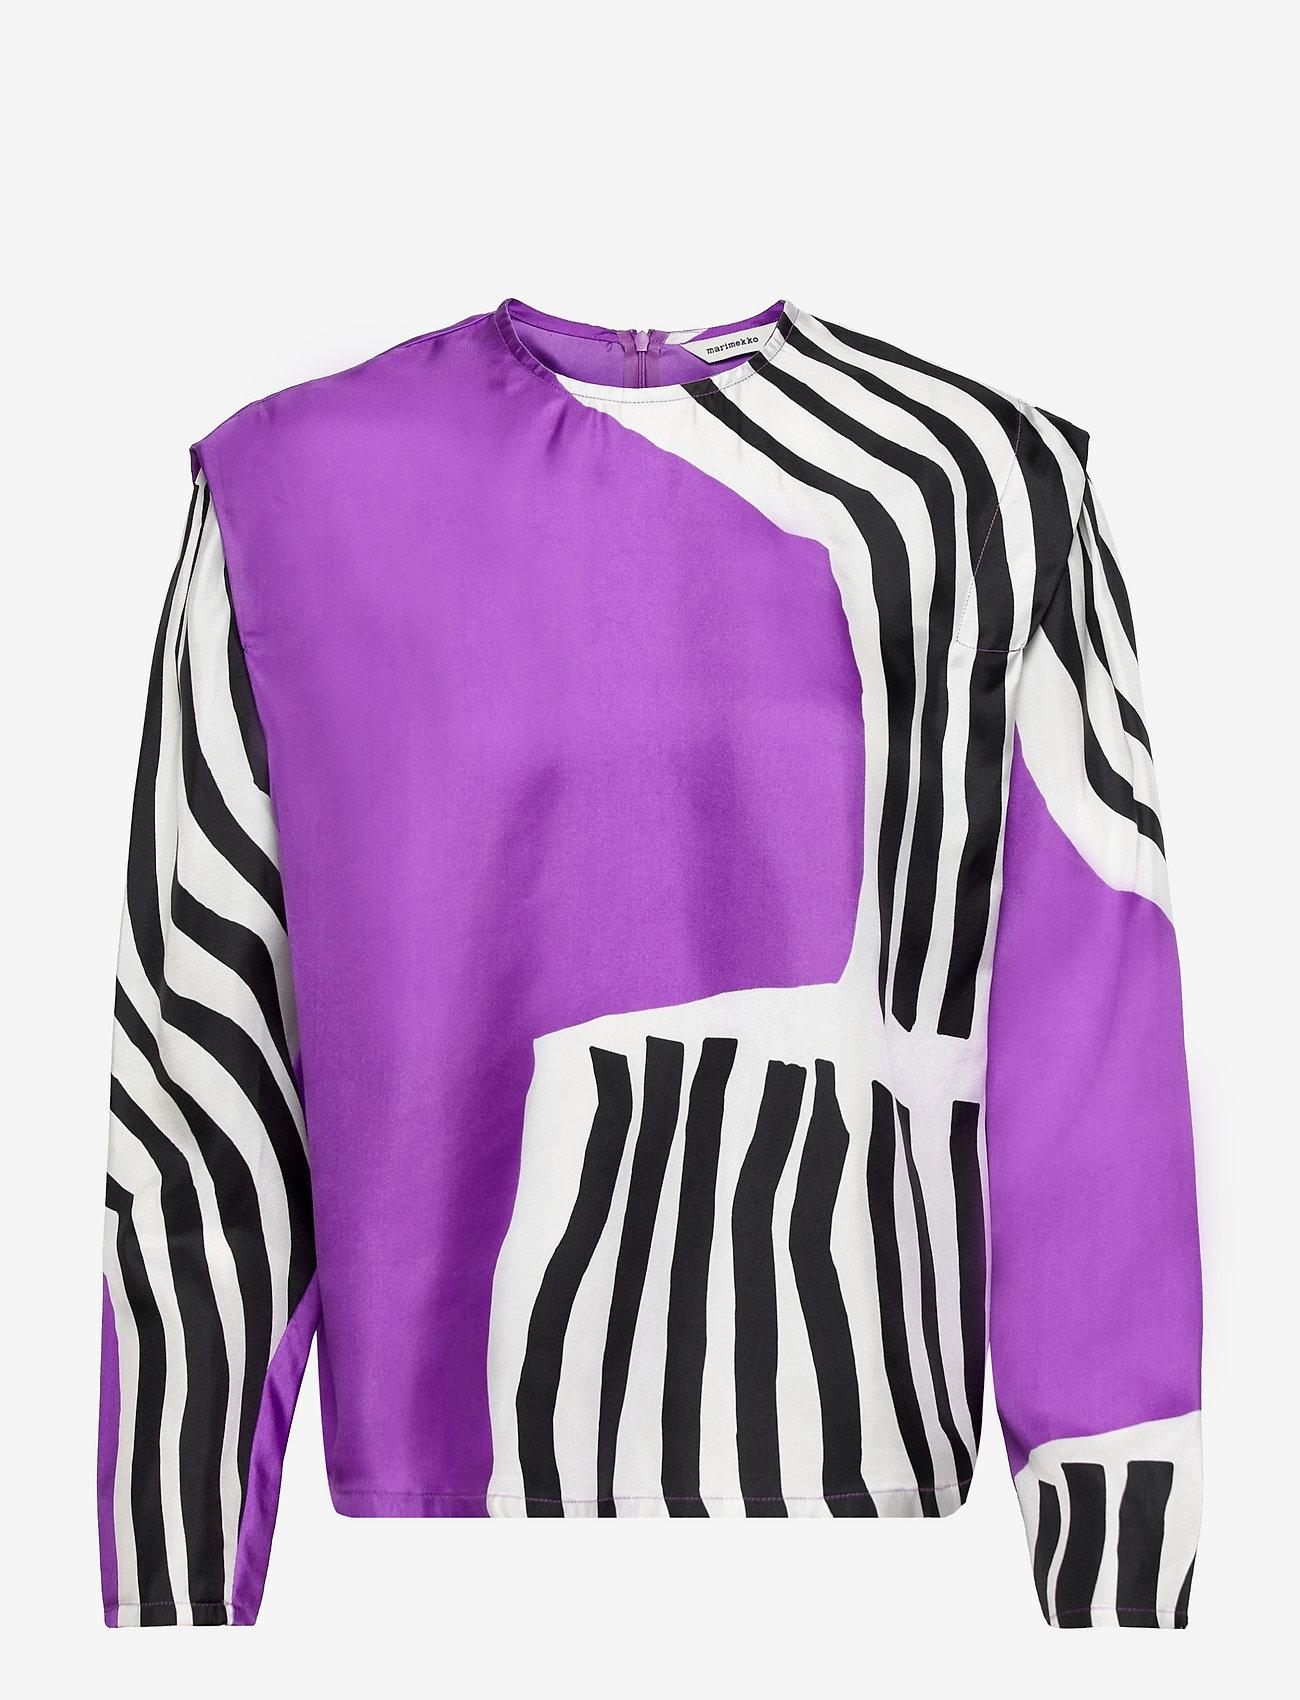 Marimekko - HUMISEE VUOLU SHIRT - langærmede bluser - violet, off-white, black - 0